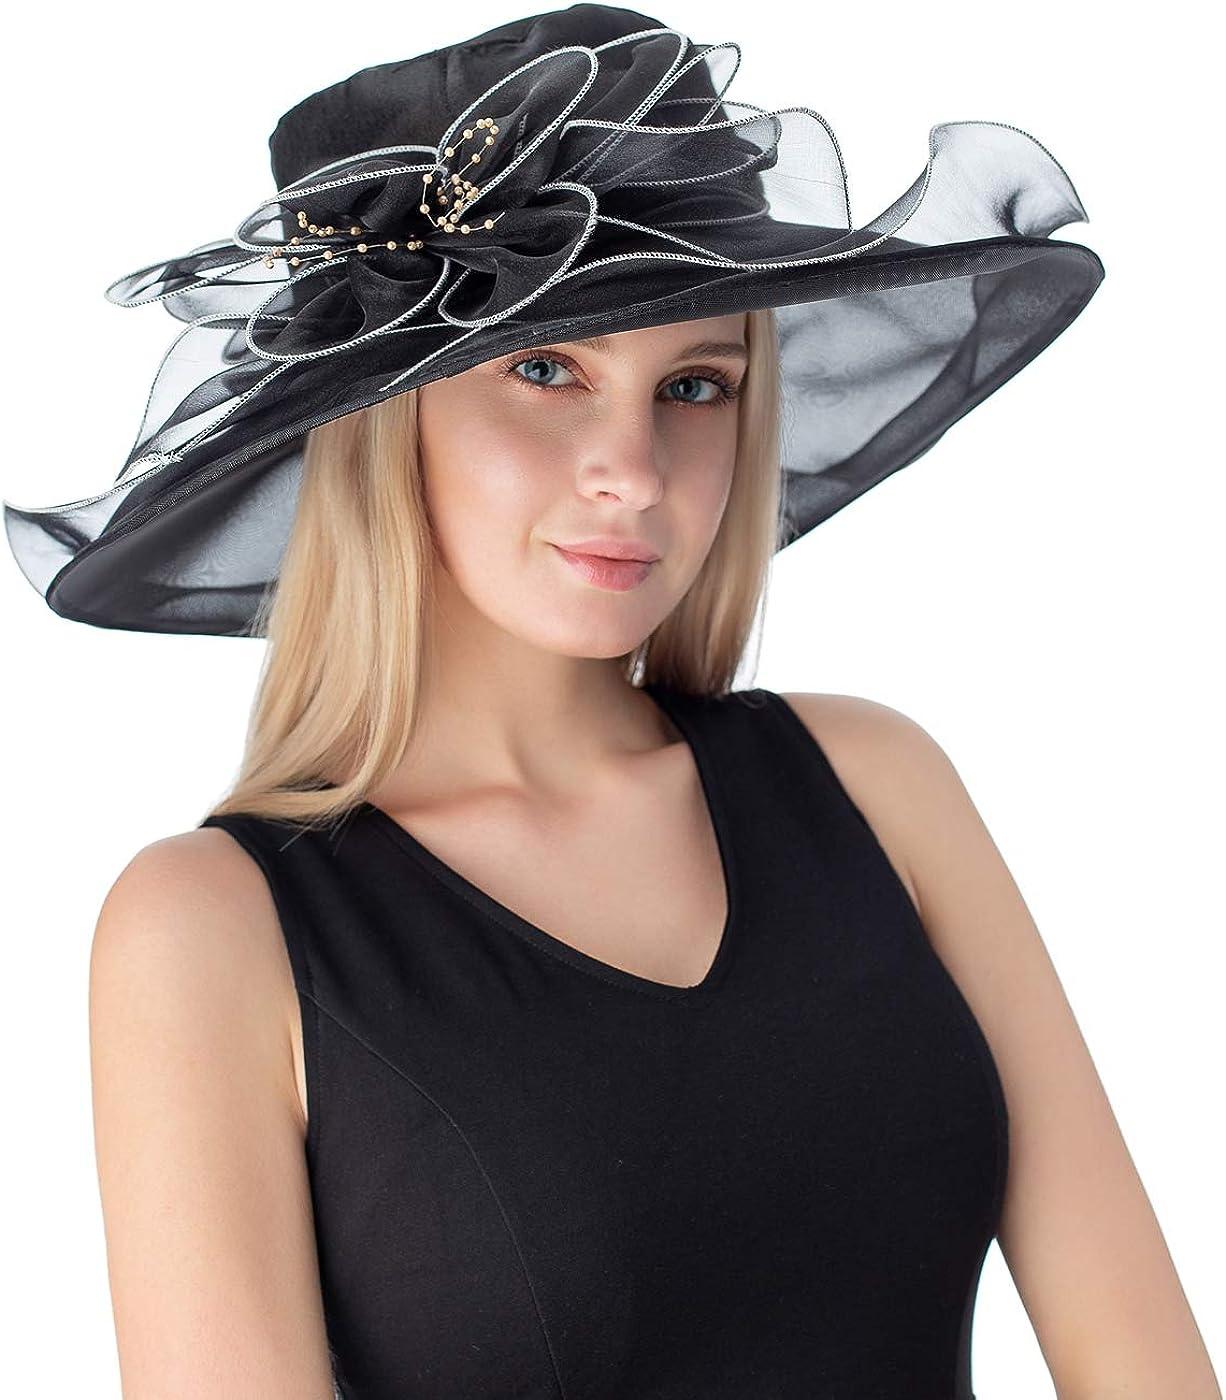 FELIZHOUSE Women's Floral Organza Tea Party Hat Ladies Kentucky Derby Fascinator Hats for Bridal Wedding Sun Hats